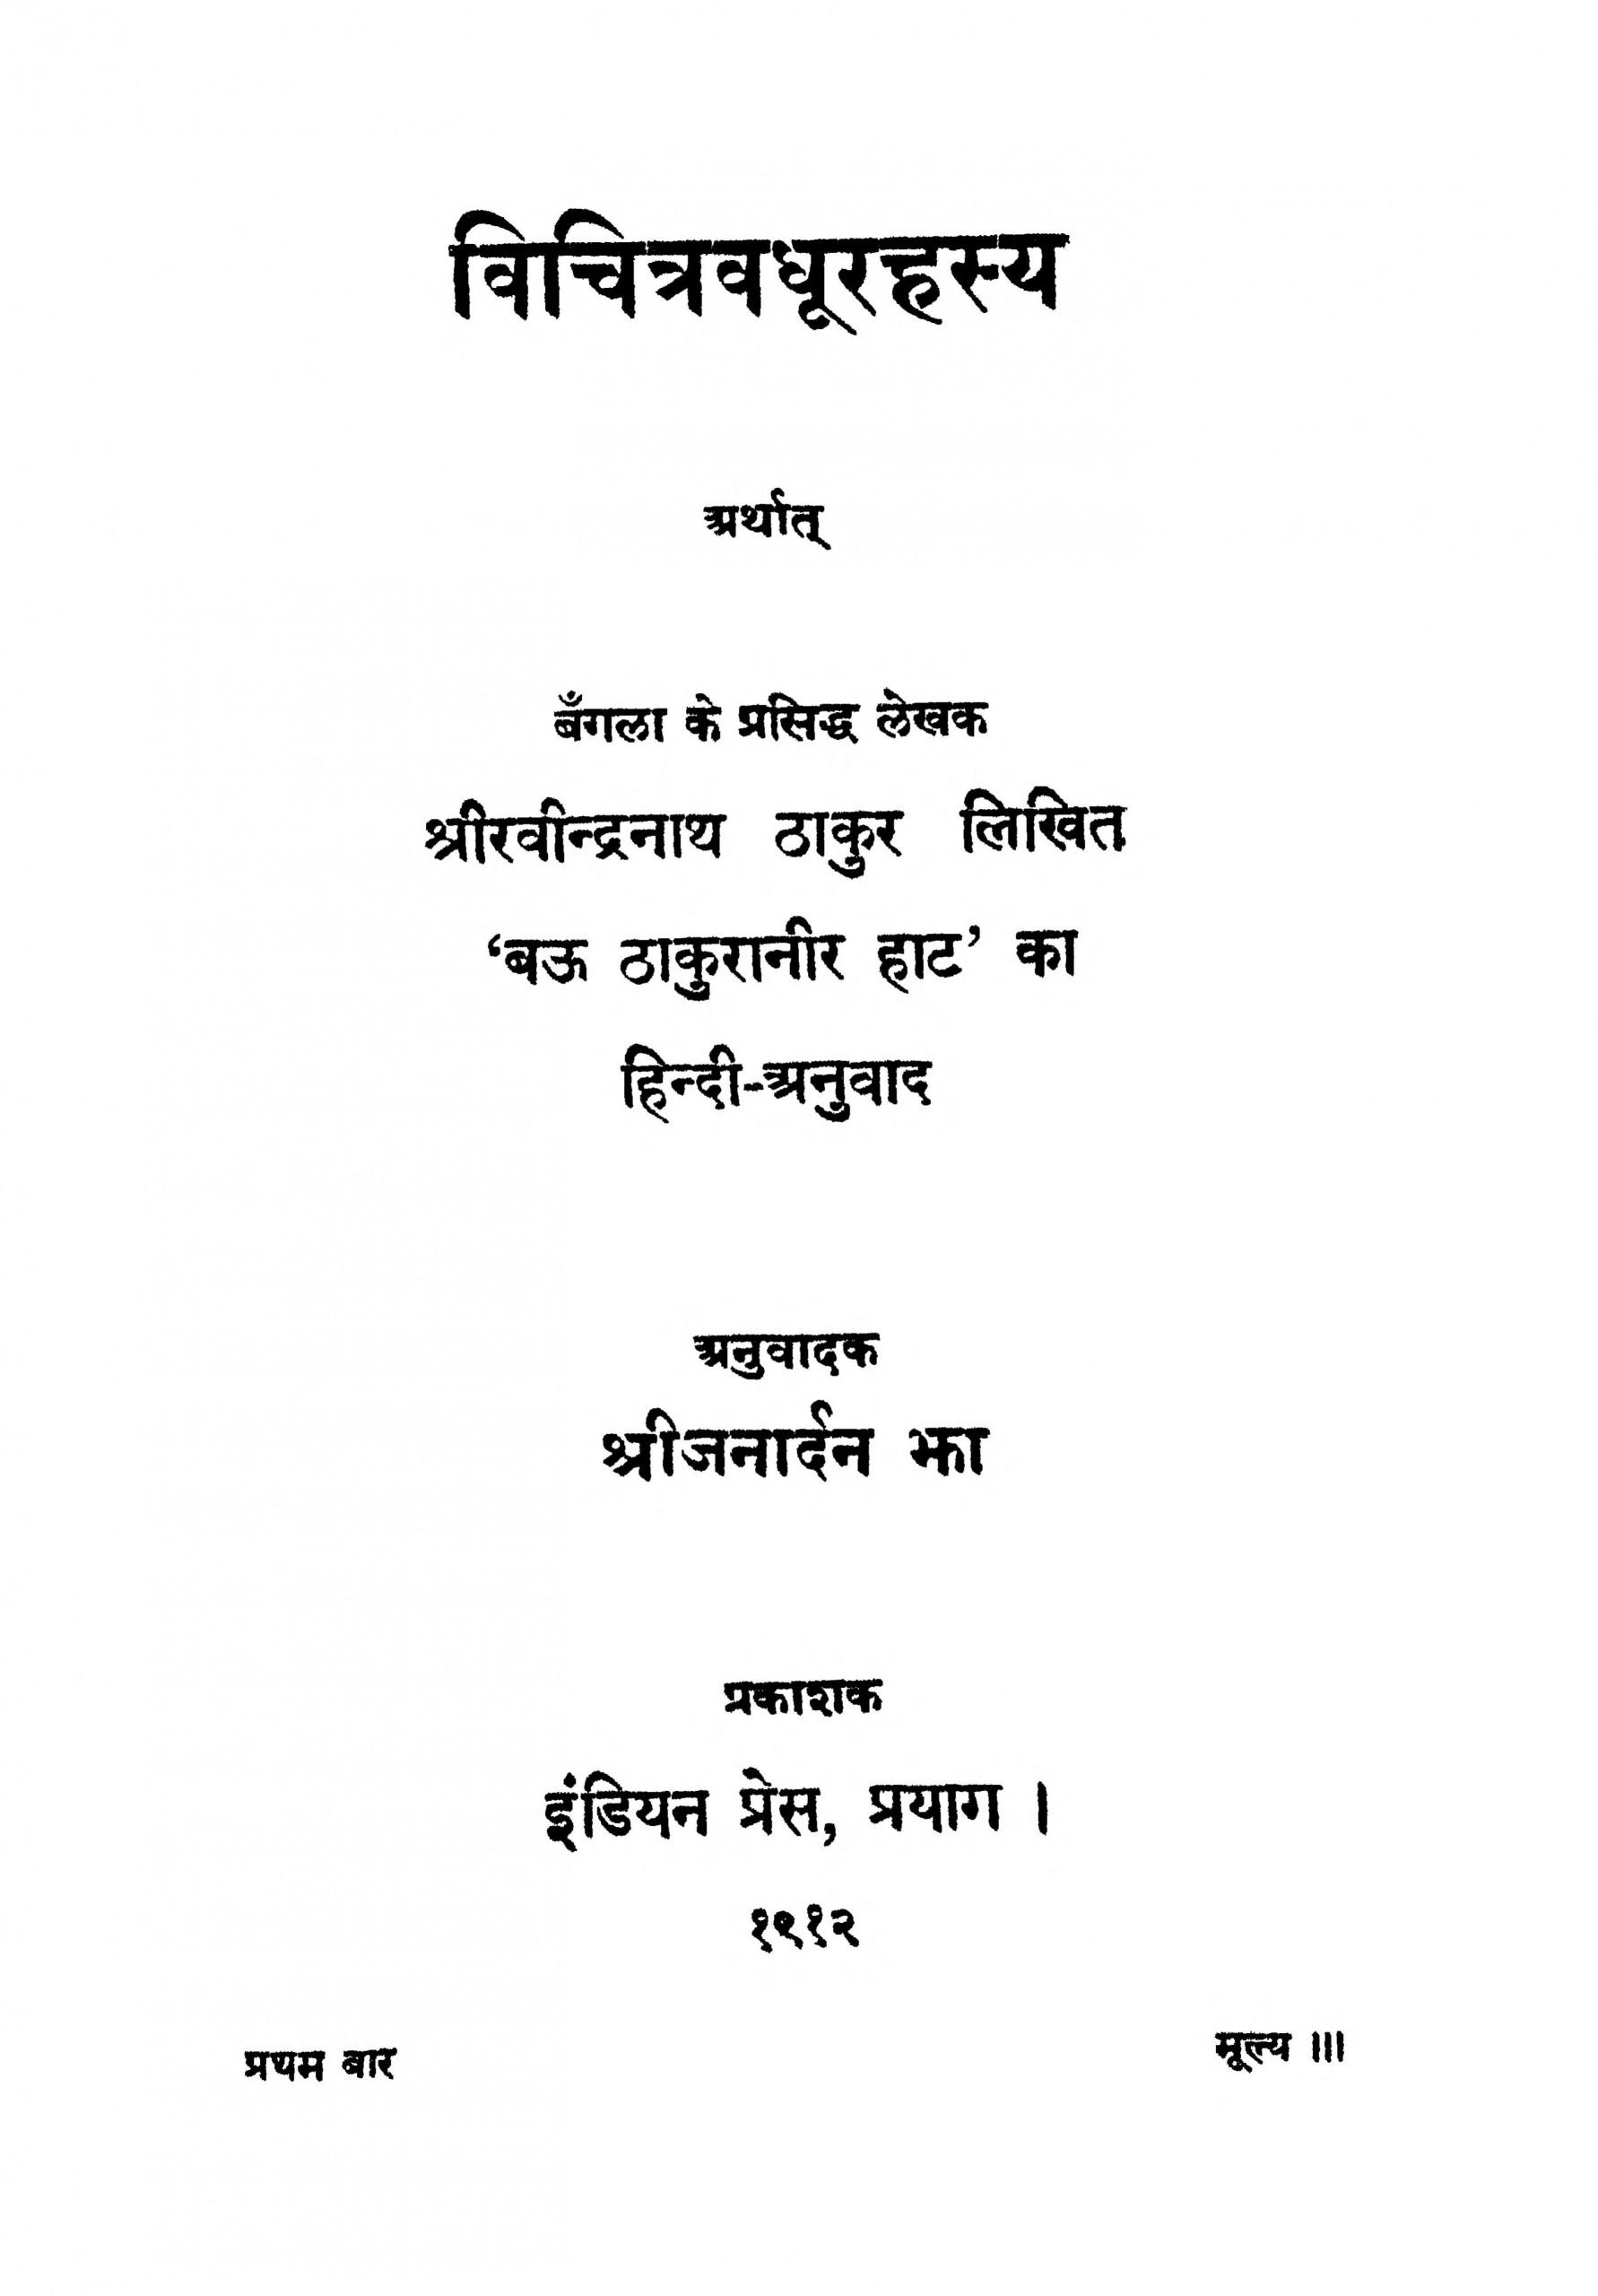 Vichitra Badhu Rahasy by रवीन्द्रनाथ ठाकुर - Ravindranath Thakur